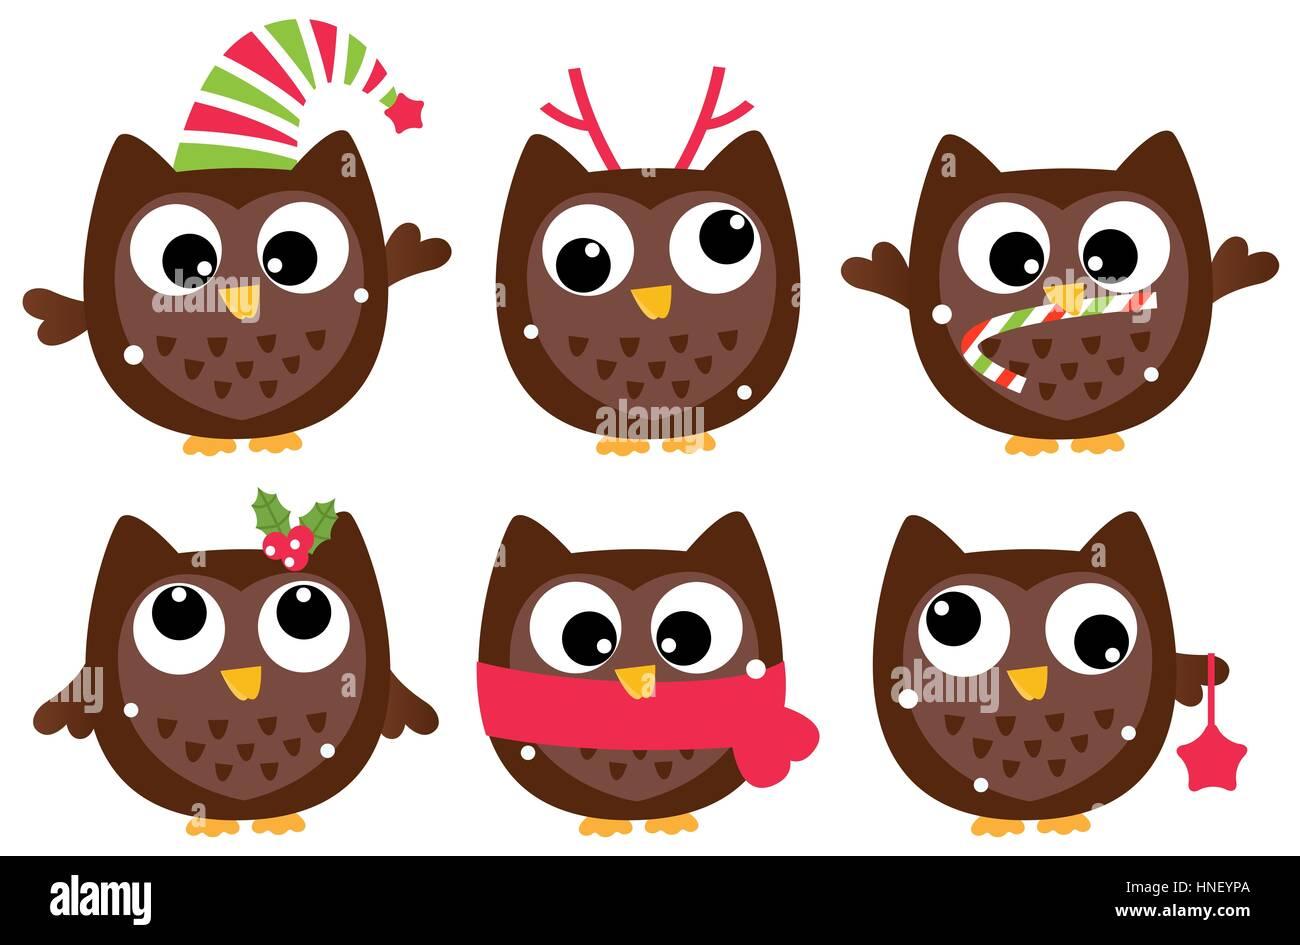 Christmas Owl.Funny Christmas Owls Cartoon Illustration Stock Photo